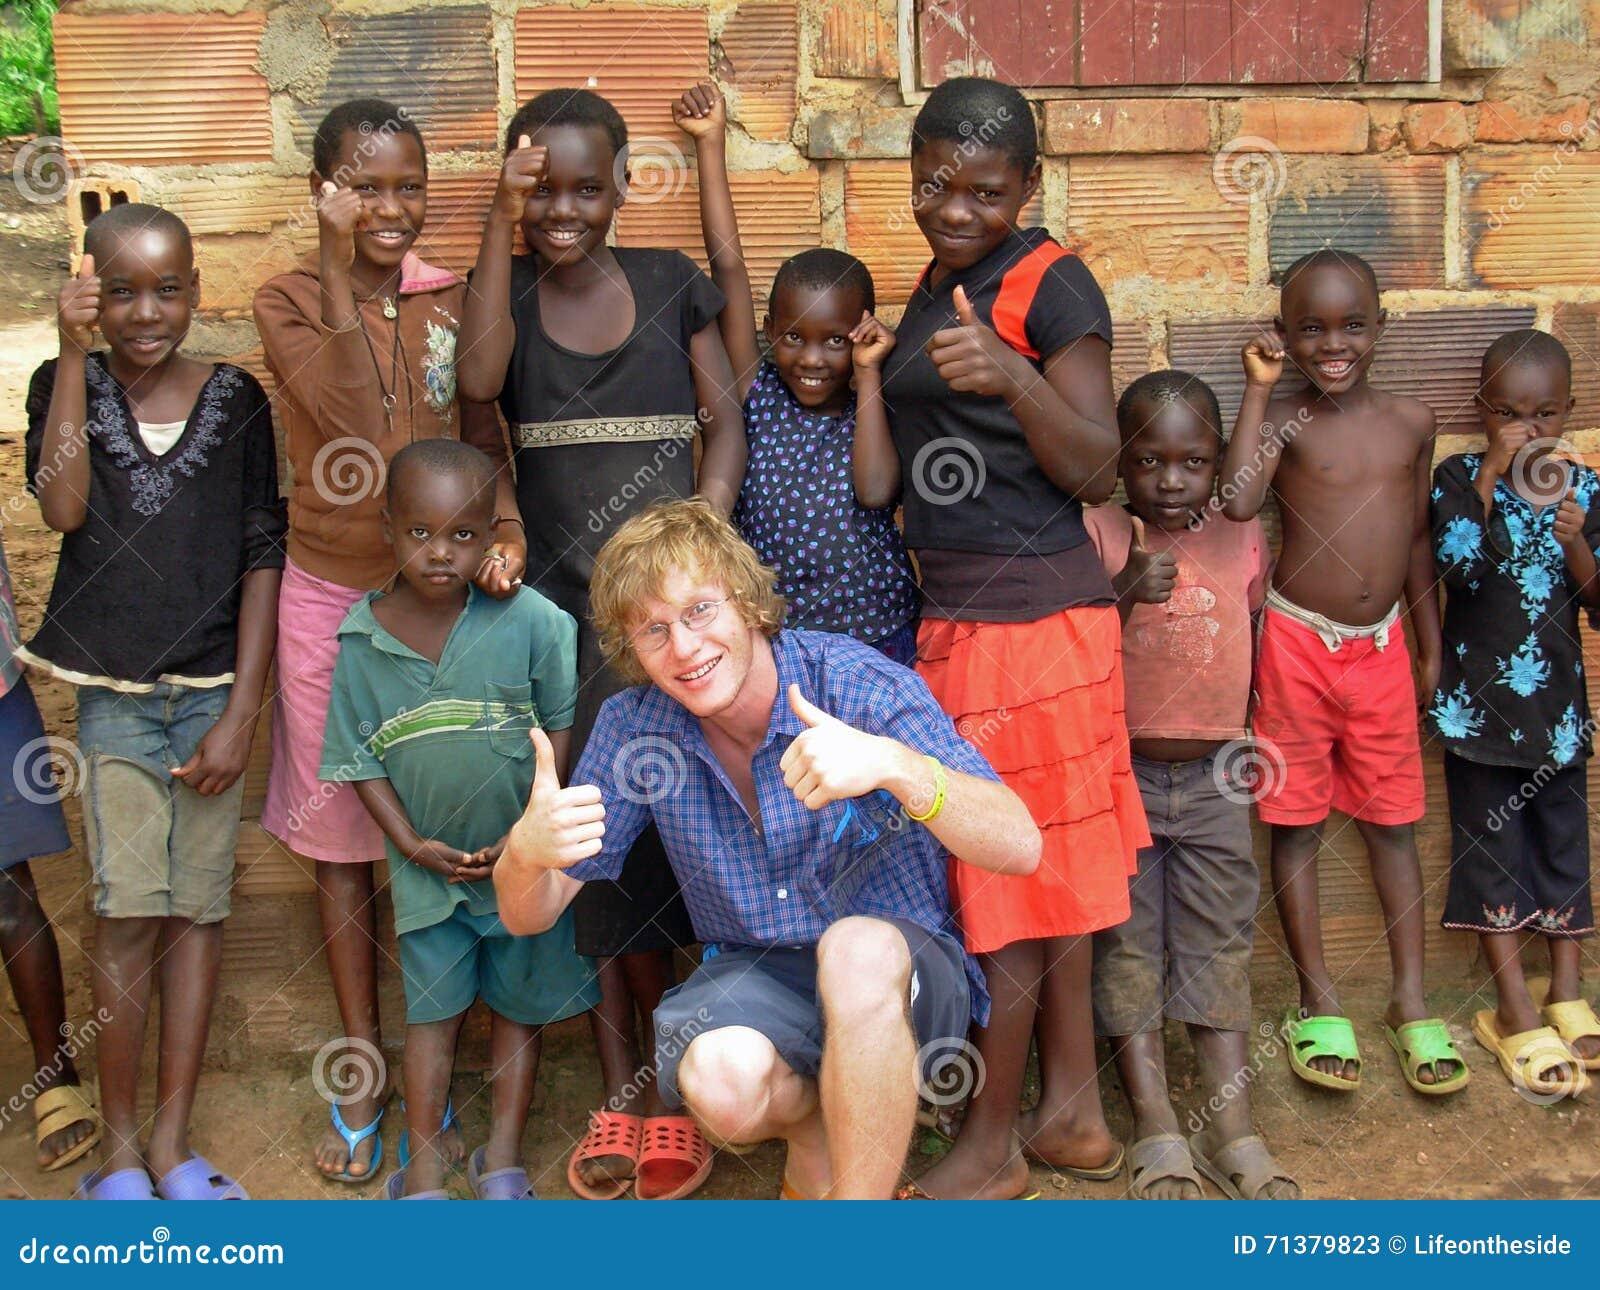 Volunteer aid relief worker having fun teaching African children thumbs up